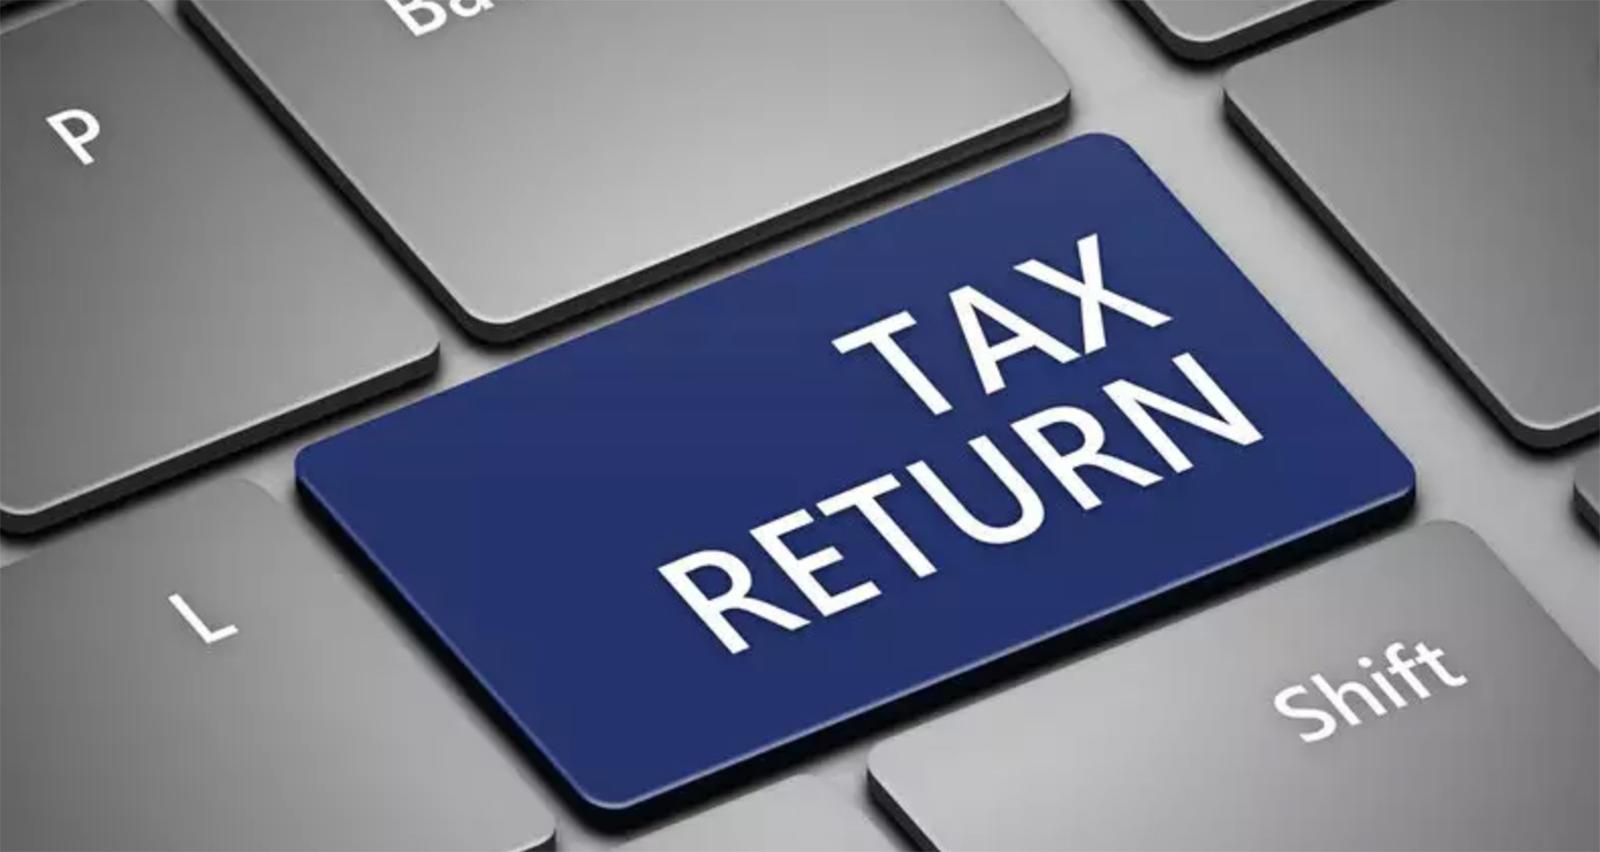 ltcg-makes-filing-income-tax-returns-tough